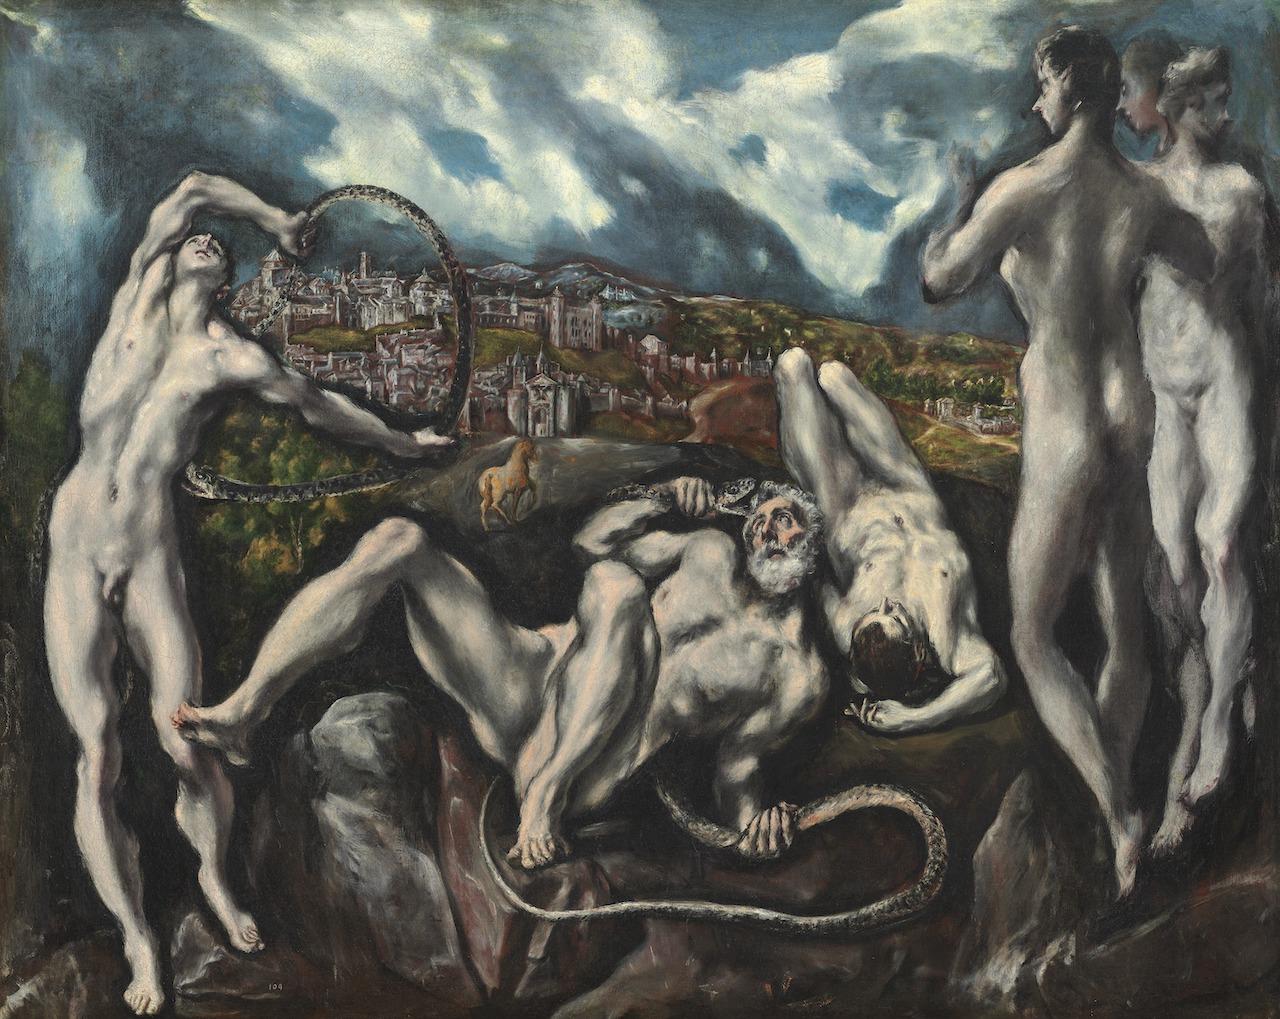 El Greco. Laokoon. 1610/1614. Öl / Leinwand.